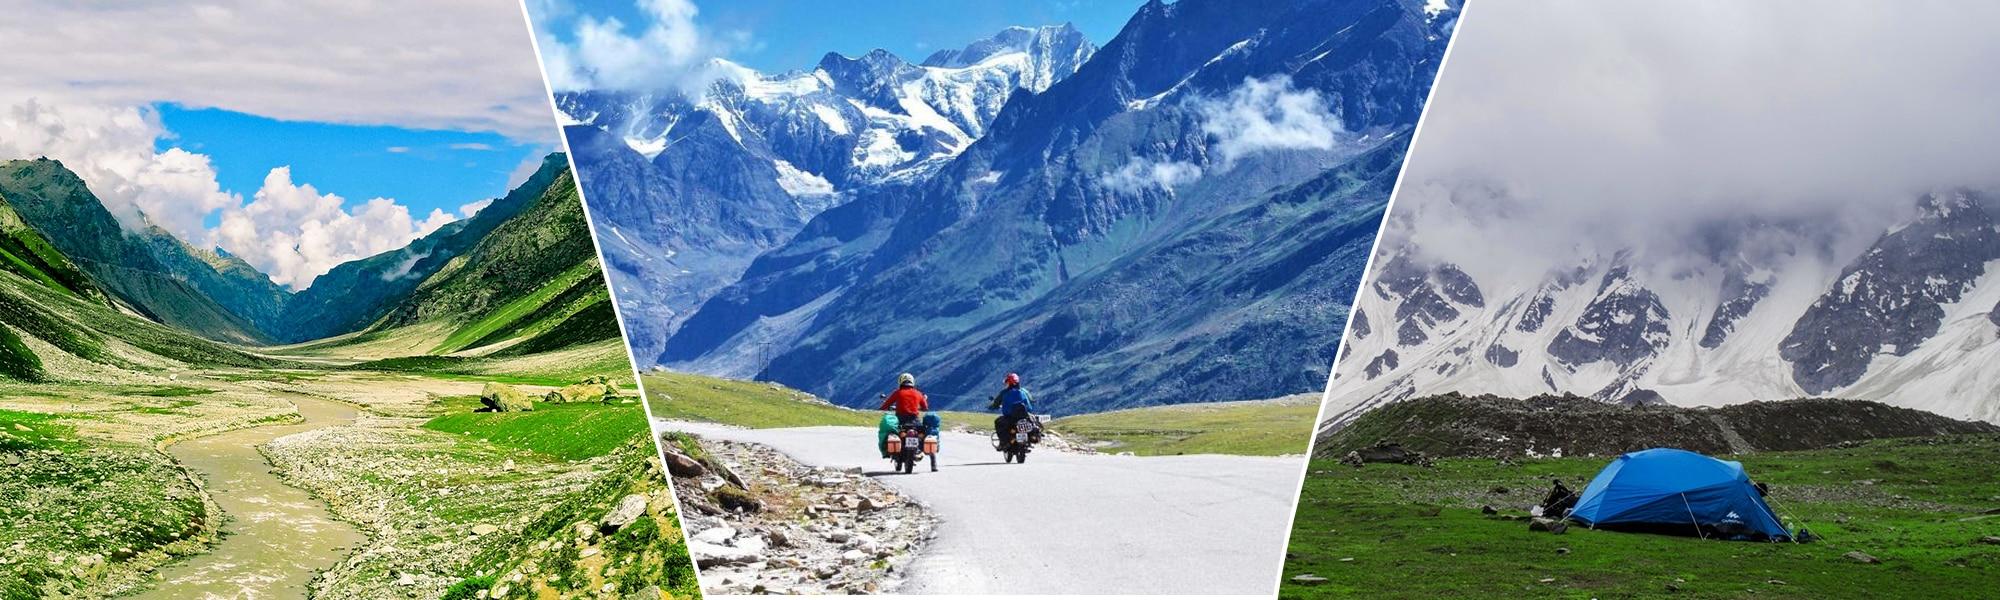 Shimla, Kullu and ManaliPackage Tour